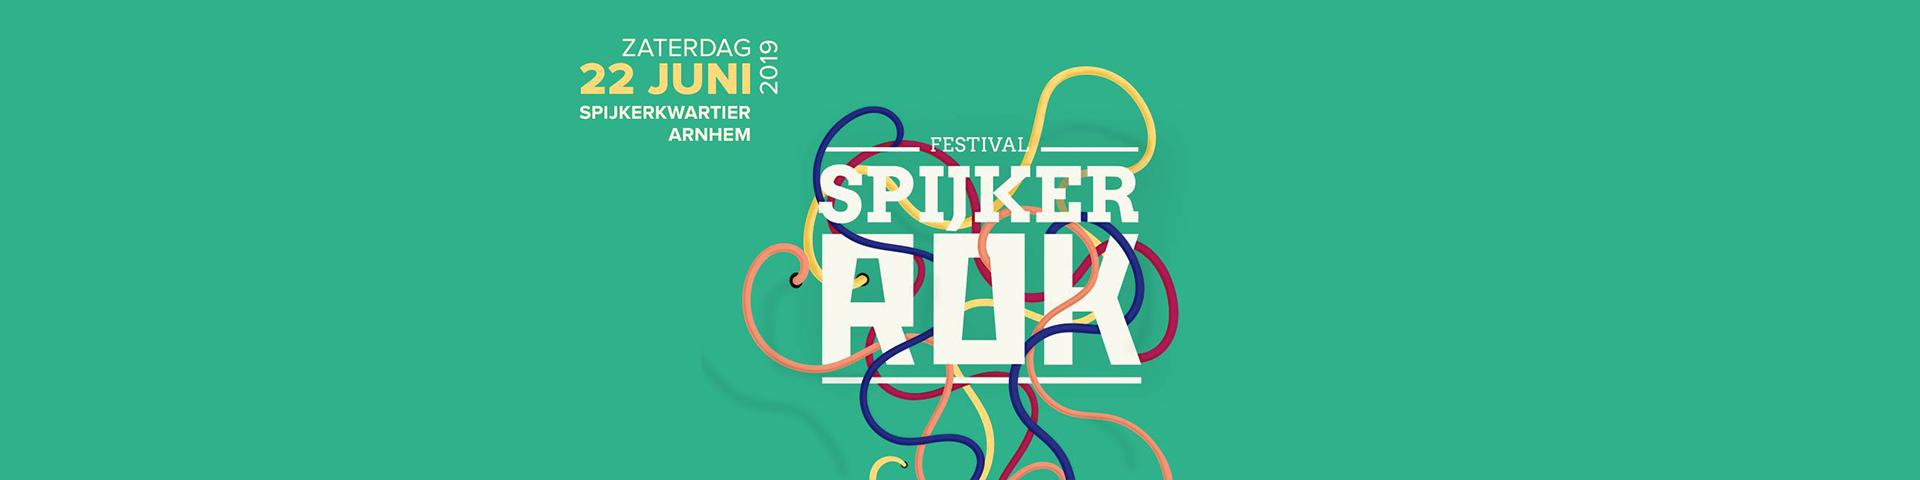 Festival Spijkerrok 2019